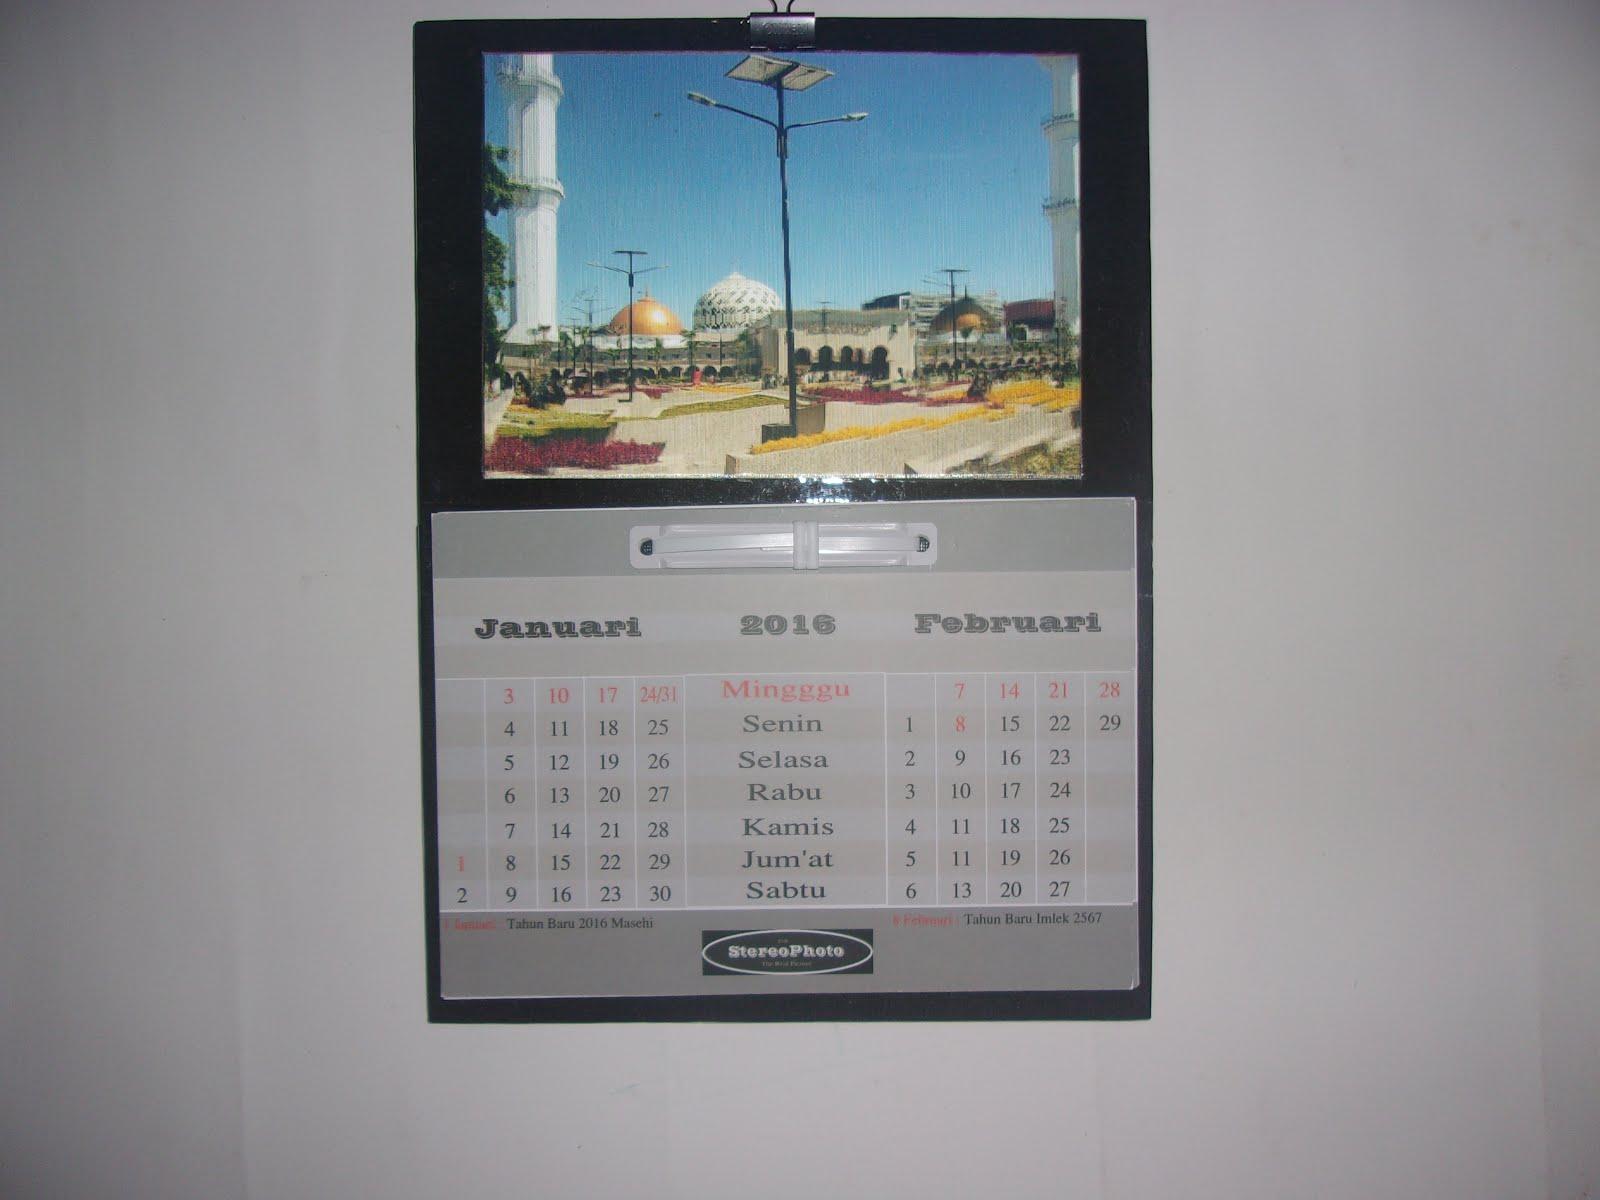 StereoPhoto - Kalender Dinding